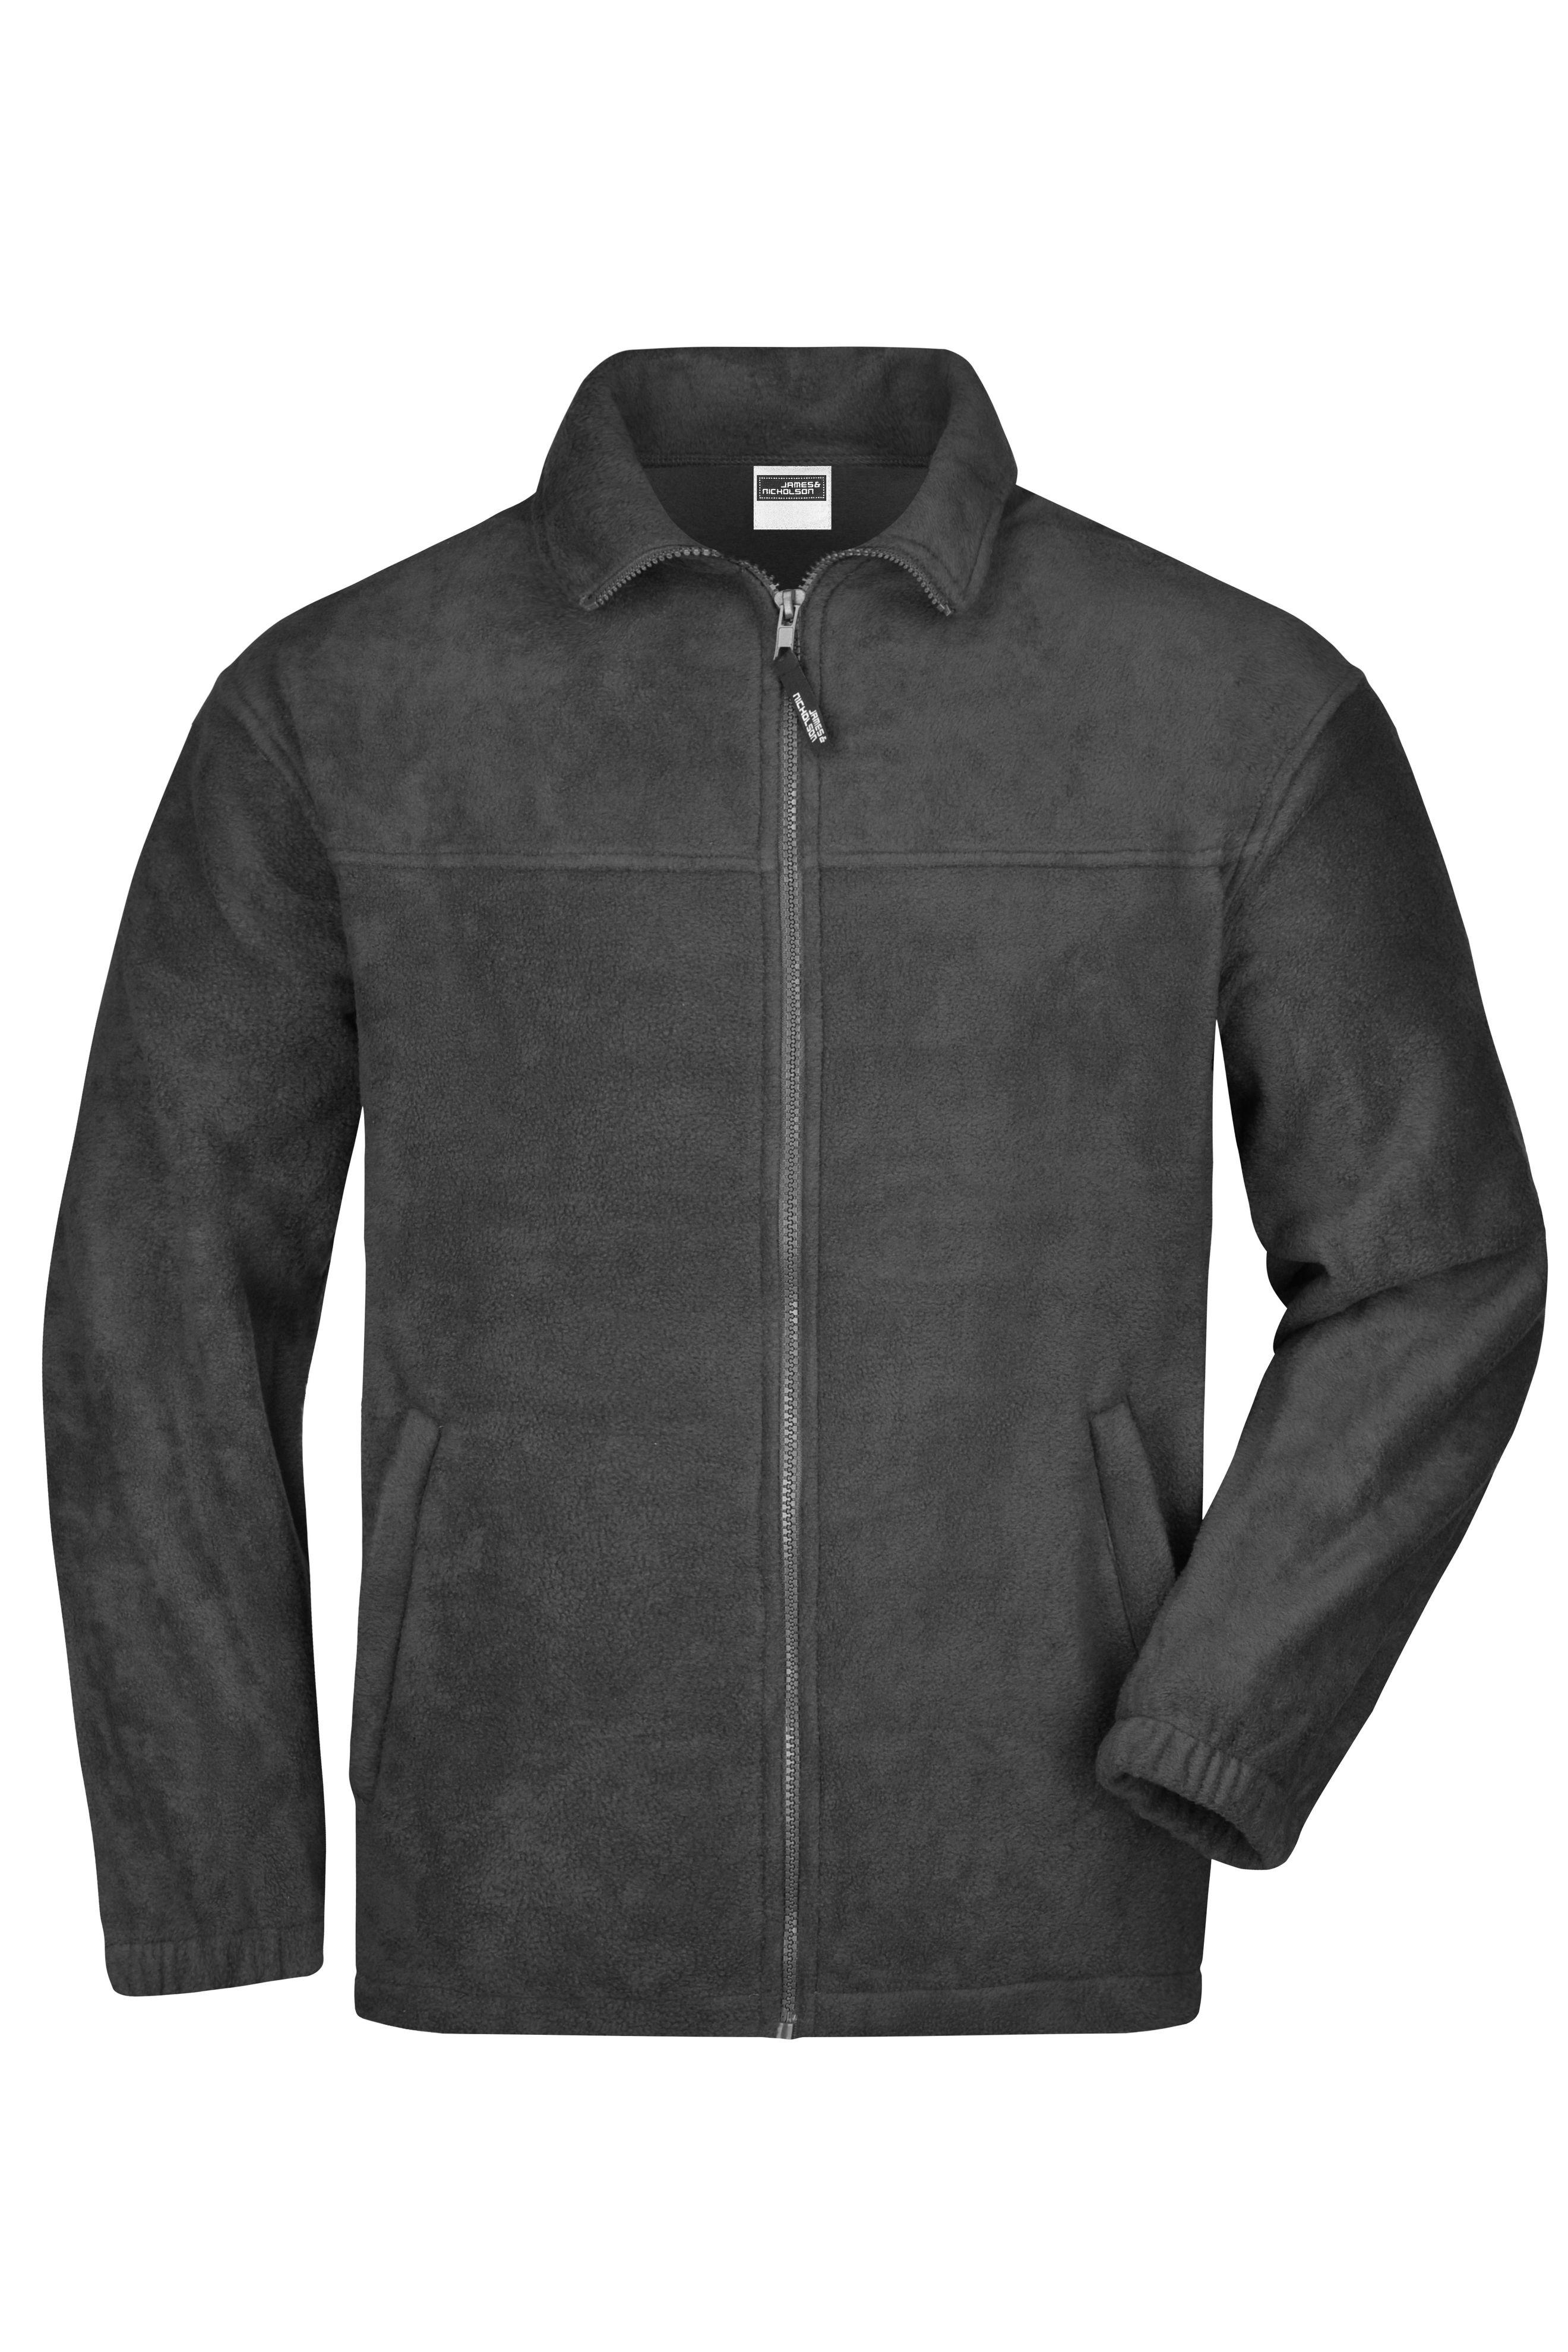 Jacke in schwerer Fleece-Qualität